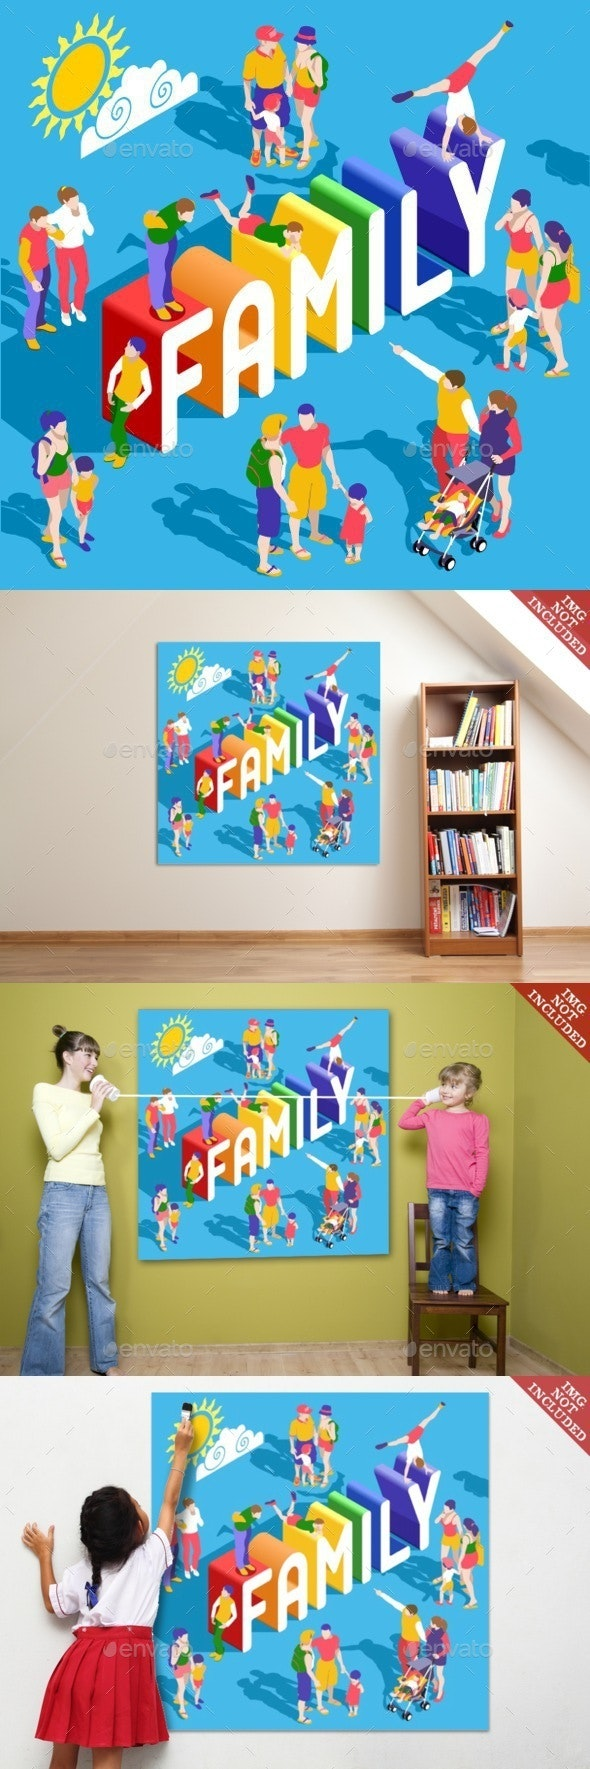 Rainbow Family People Isometric - People Characters